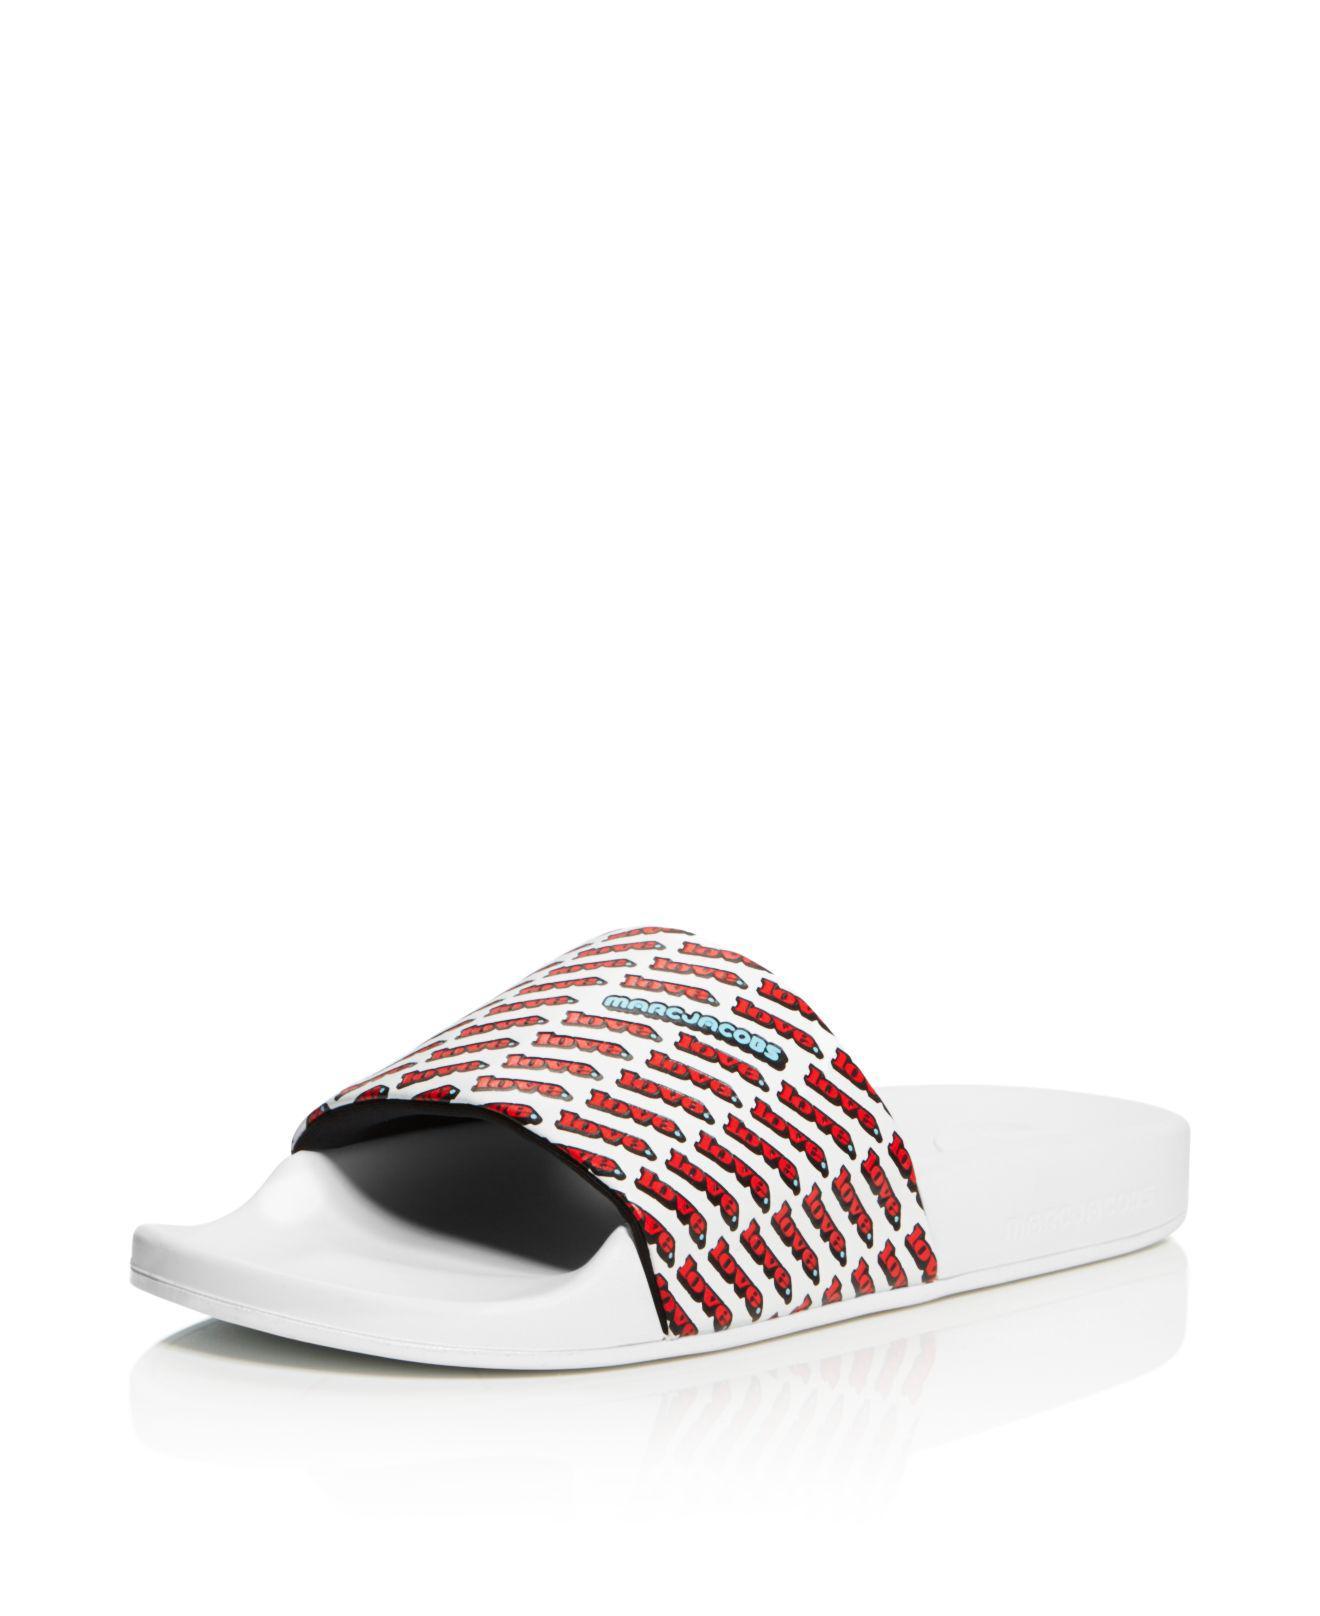 Marc Jacobs Women's Love Aqua Leather Slide Sandals 62I6a